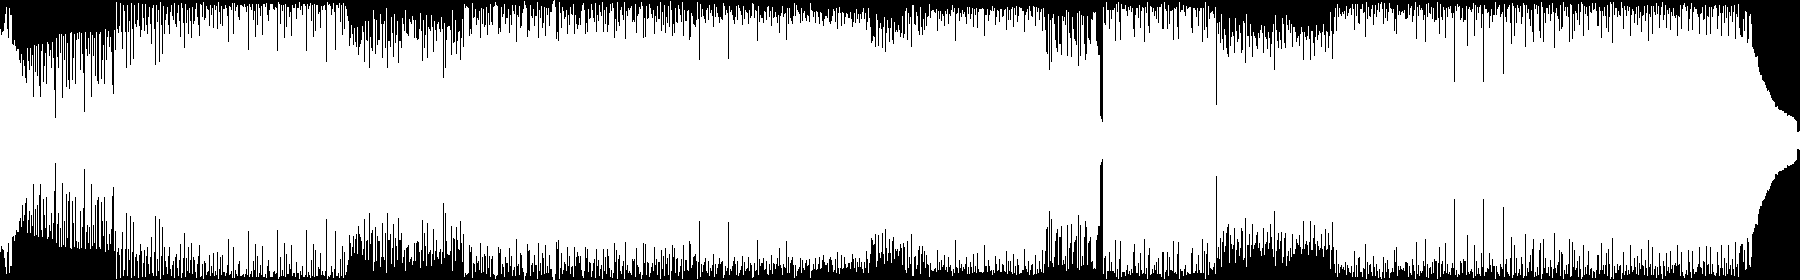 Tunecraft Deep House Elements Vol.1 Demo - Free Massive Presets audio waveform